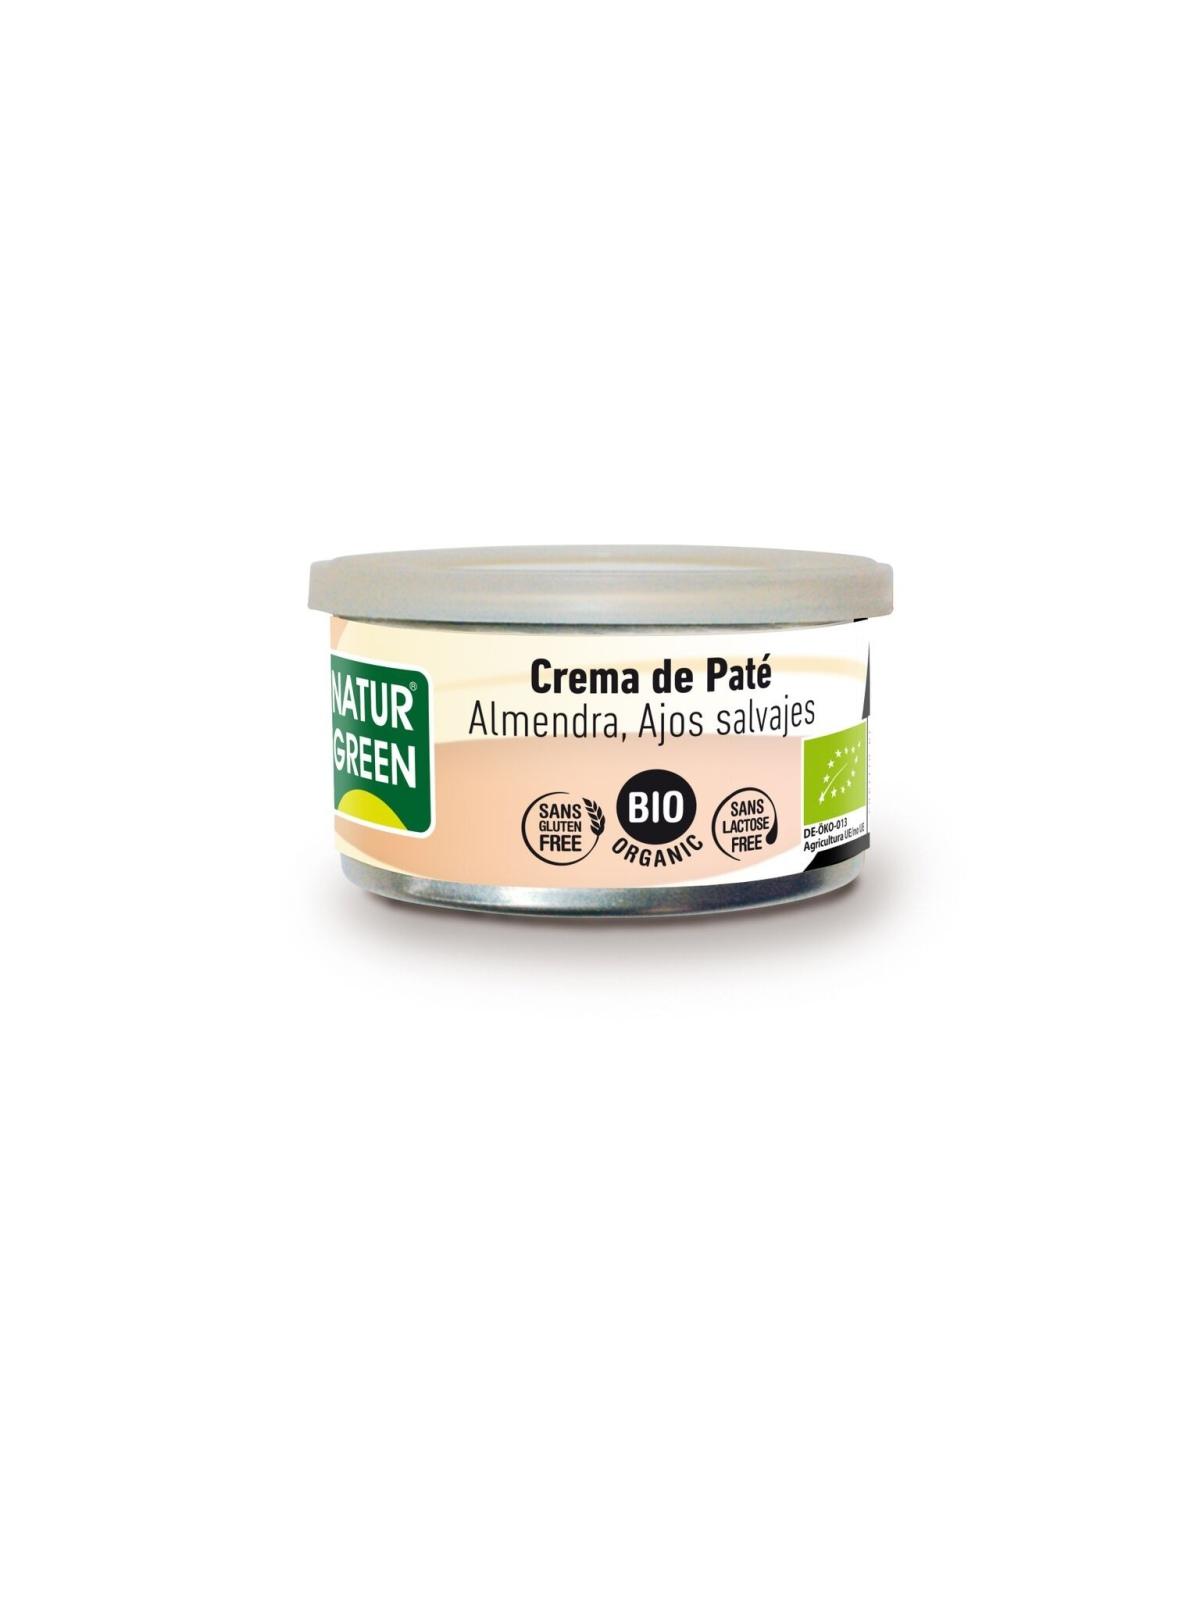 Tarrina de Crema Paté Almendra Ajos Salvajes Bio Naturgreen 125 g